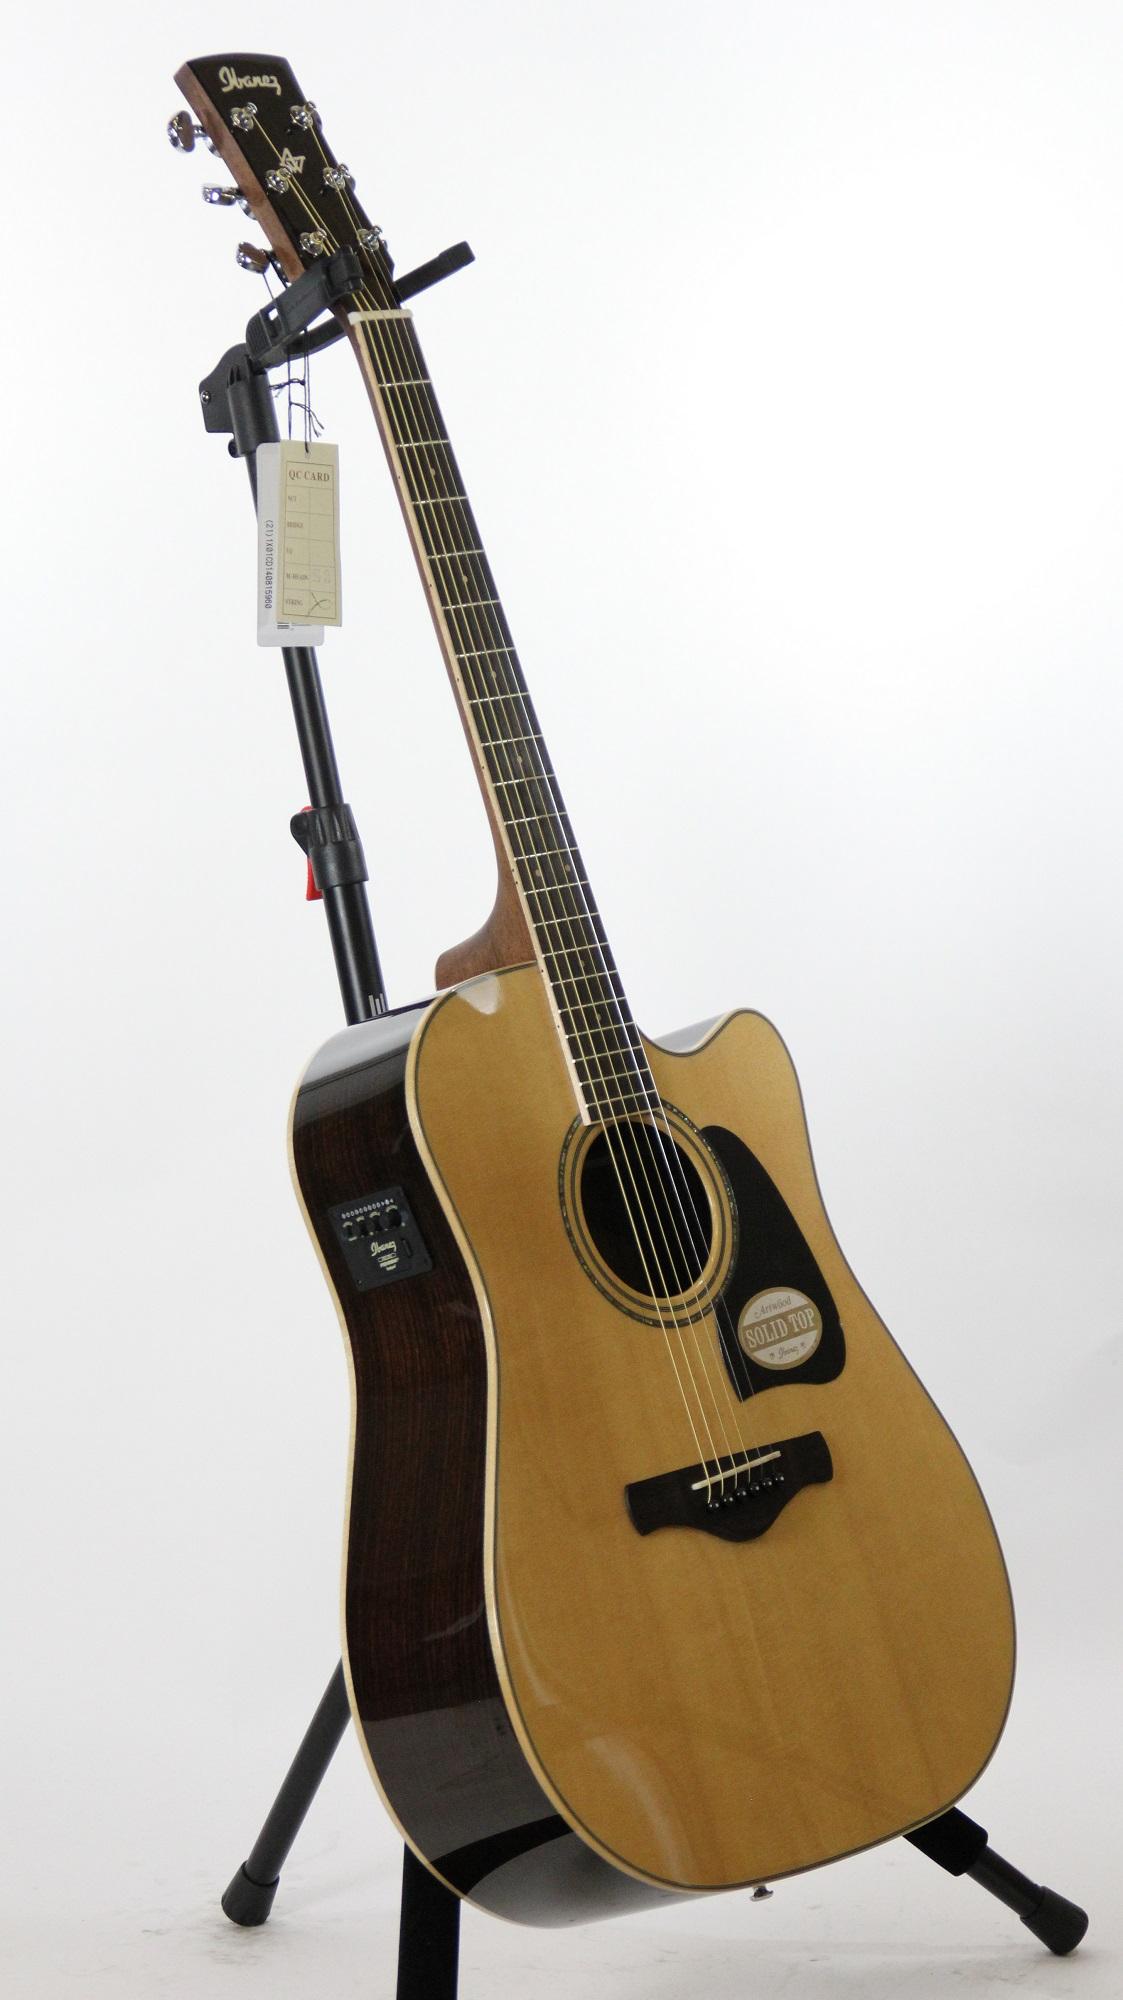 ibanez aw535ce artwood grand concert electric acoustic guitar 6. Black Bedroom Furniture Sets. Home Design Ideas